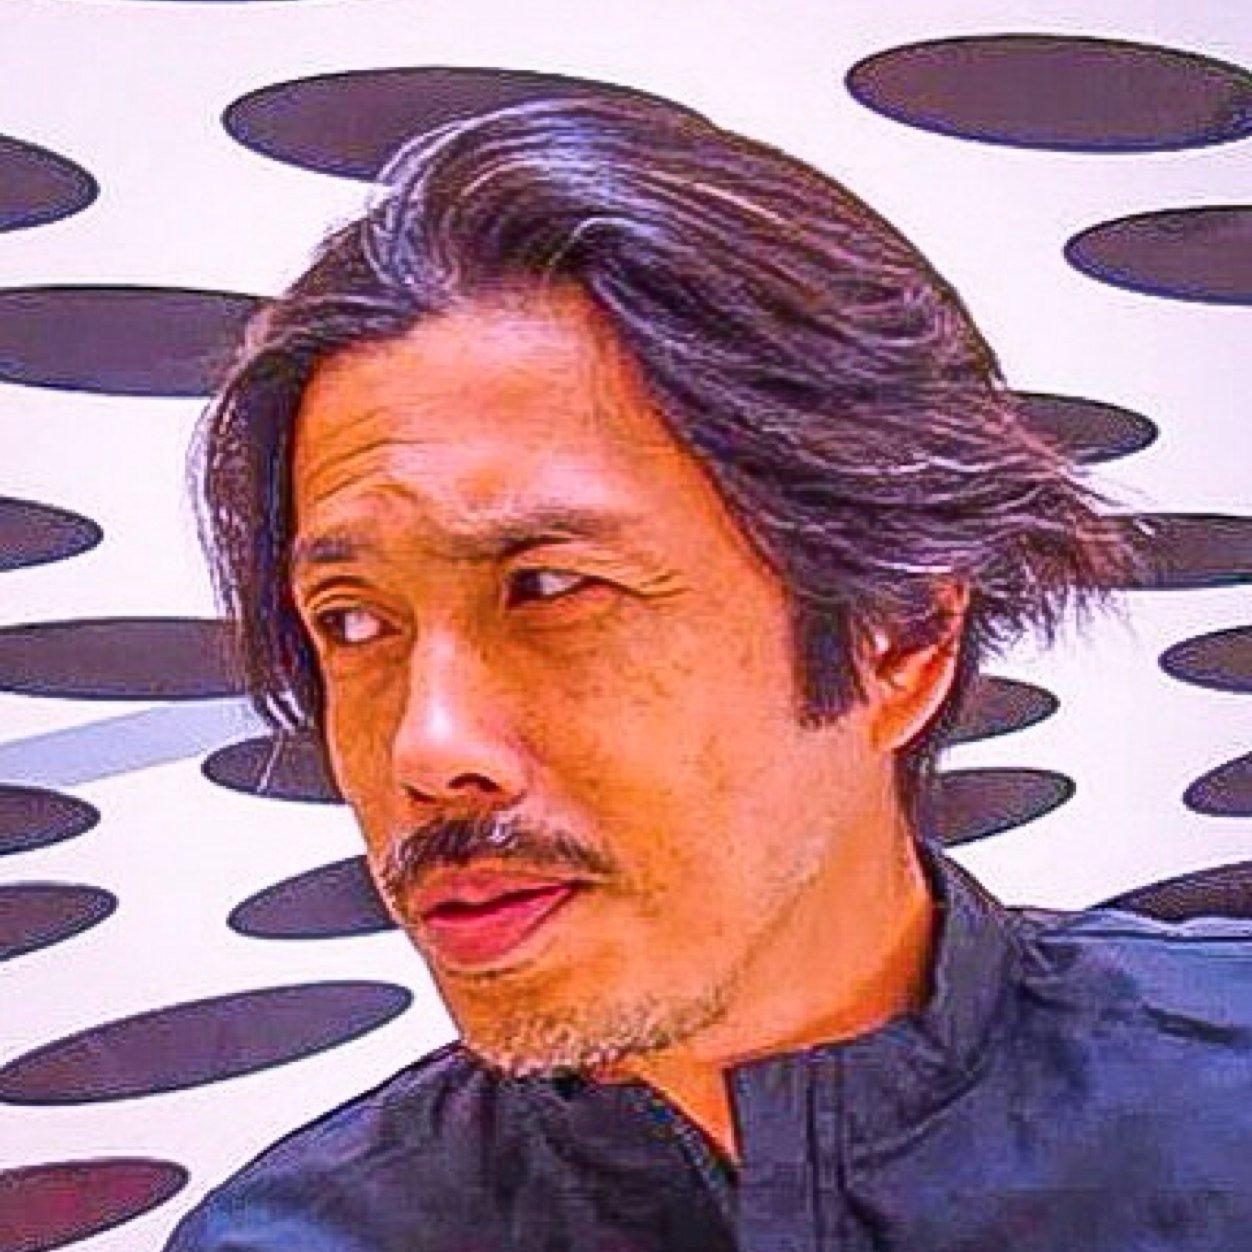 Nakayama HD wallpapers, Desktop wallpaper - most viewed